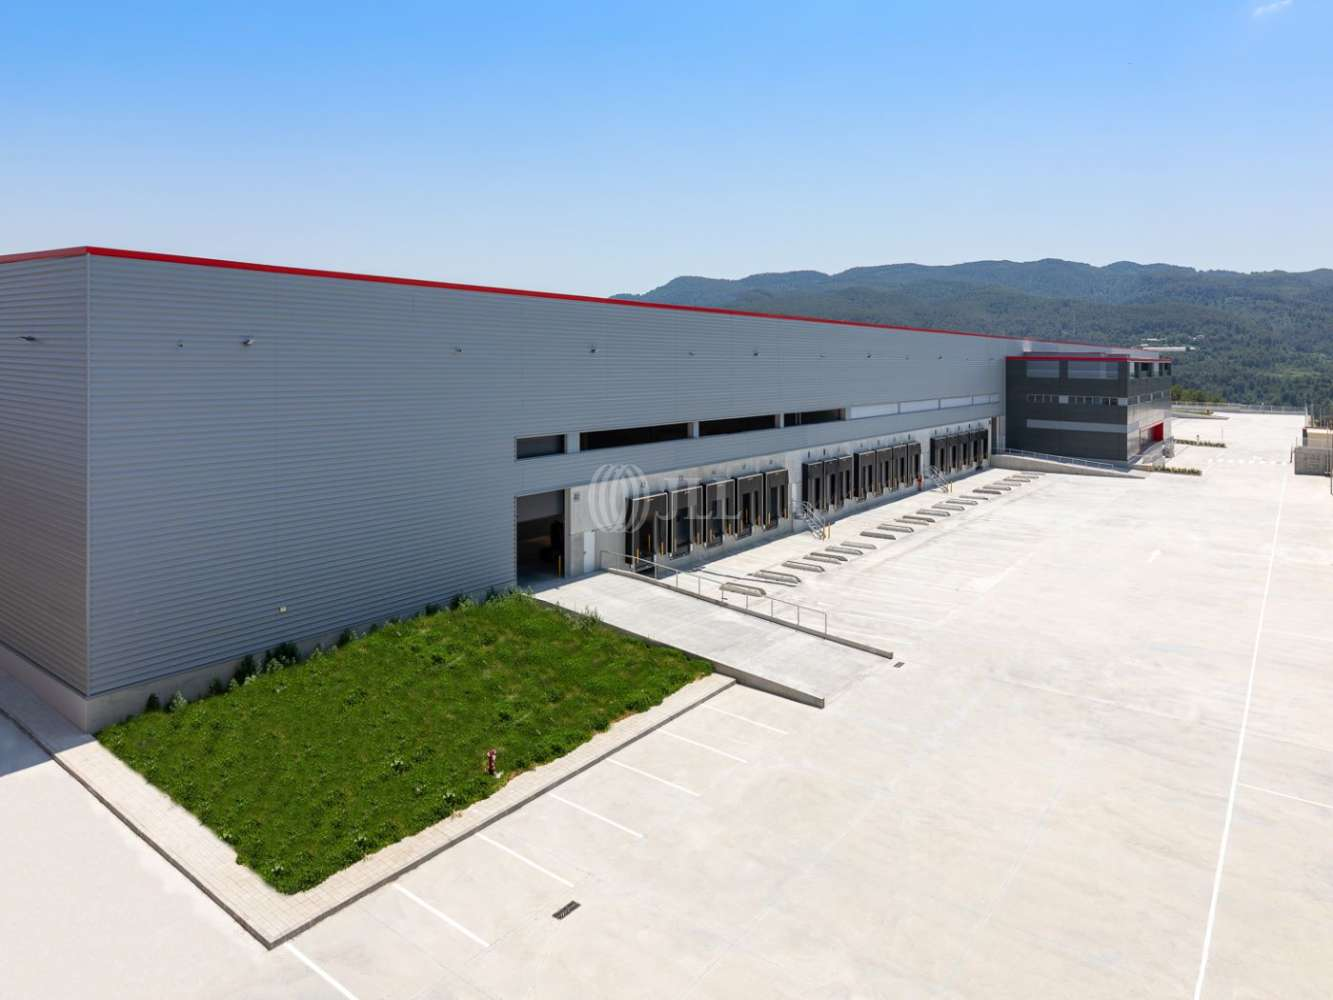 Naves industriales y logísticas Sant esteve sesrovires, 08635 - Nave Logistica - B0380 - PI CAN MARGARIT